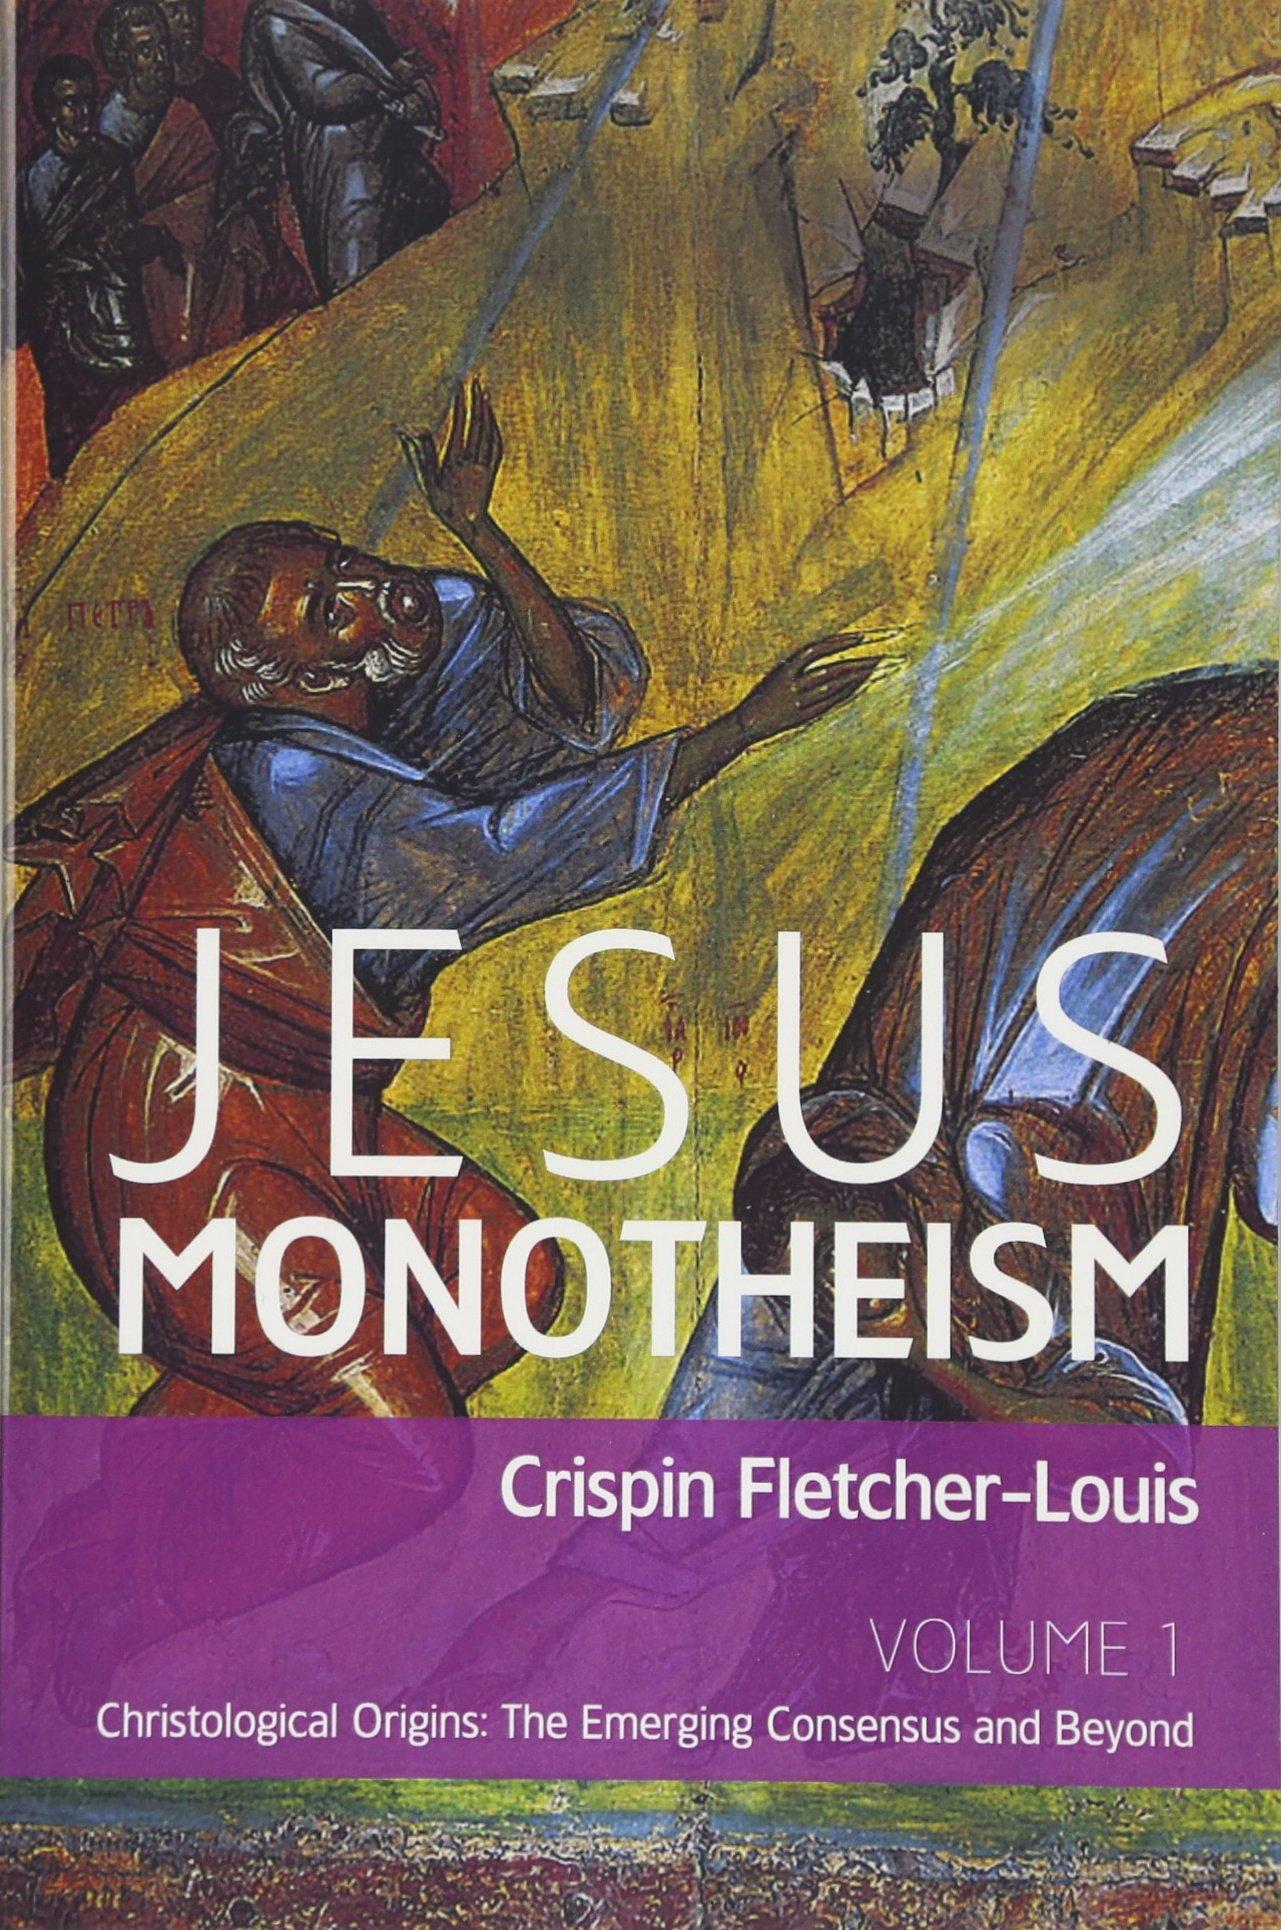 Read Online Jesus Monotheism : Volume 1: Christological Origins: The Emerging Consensus and Beyond pdf epub